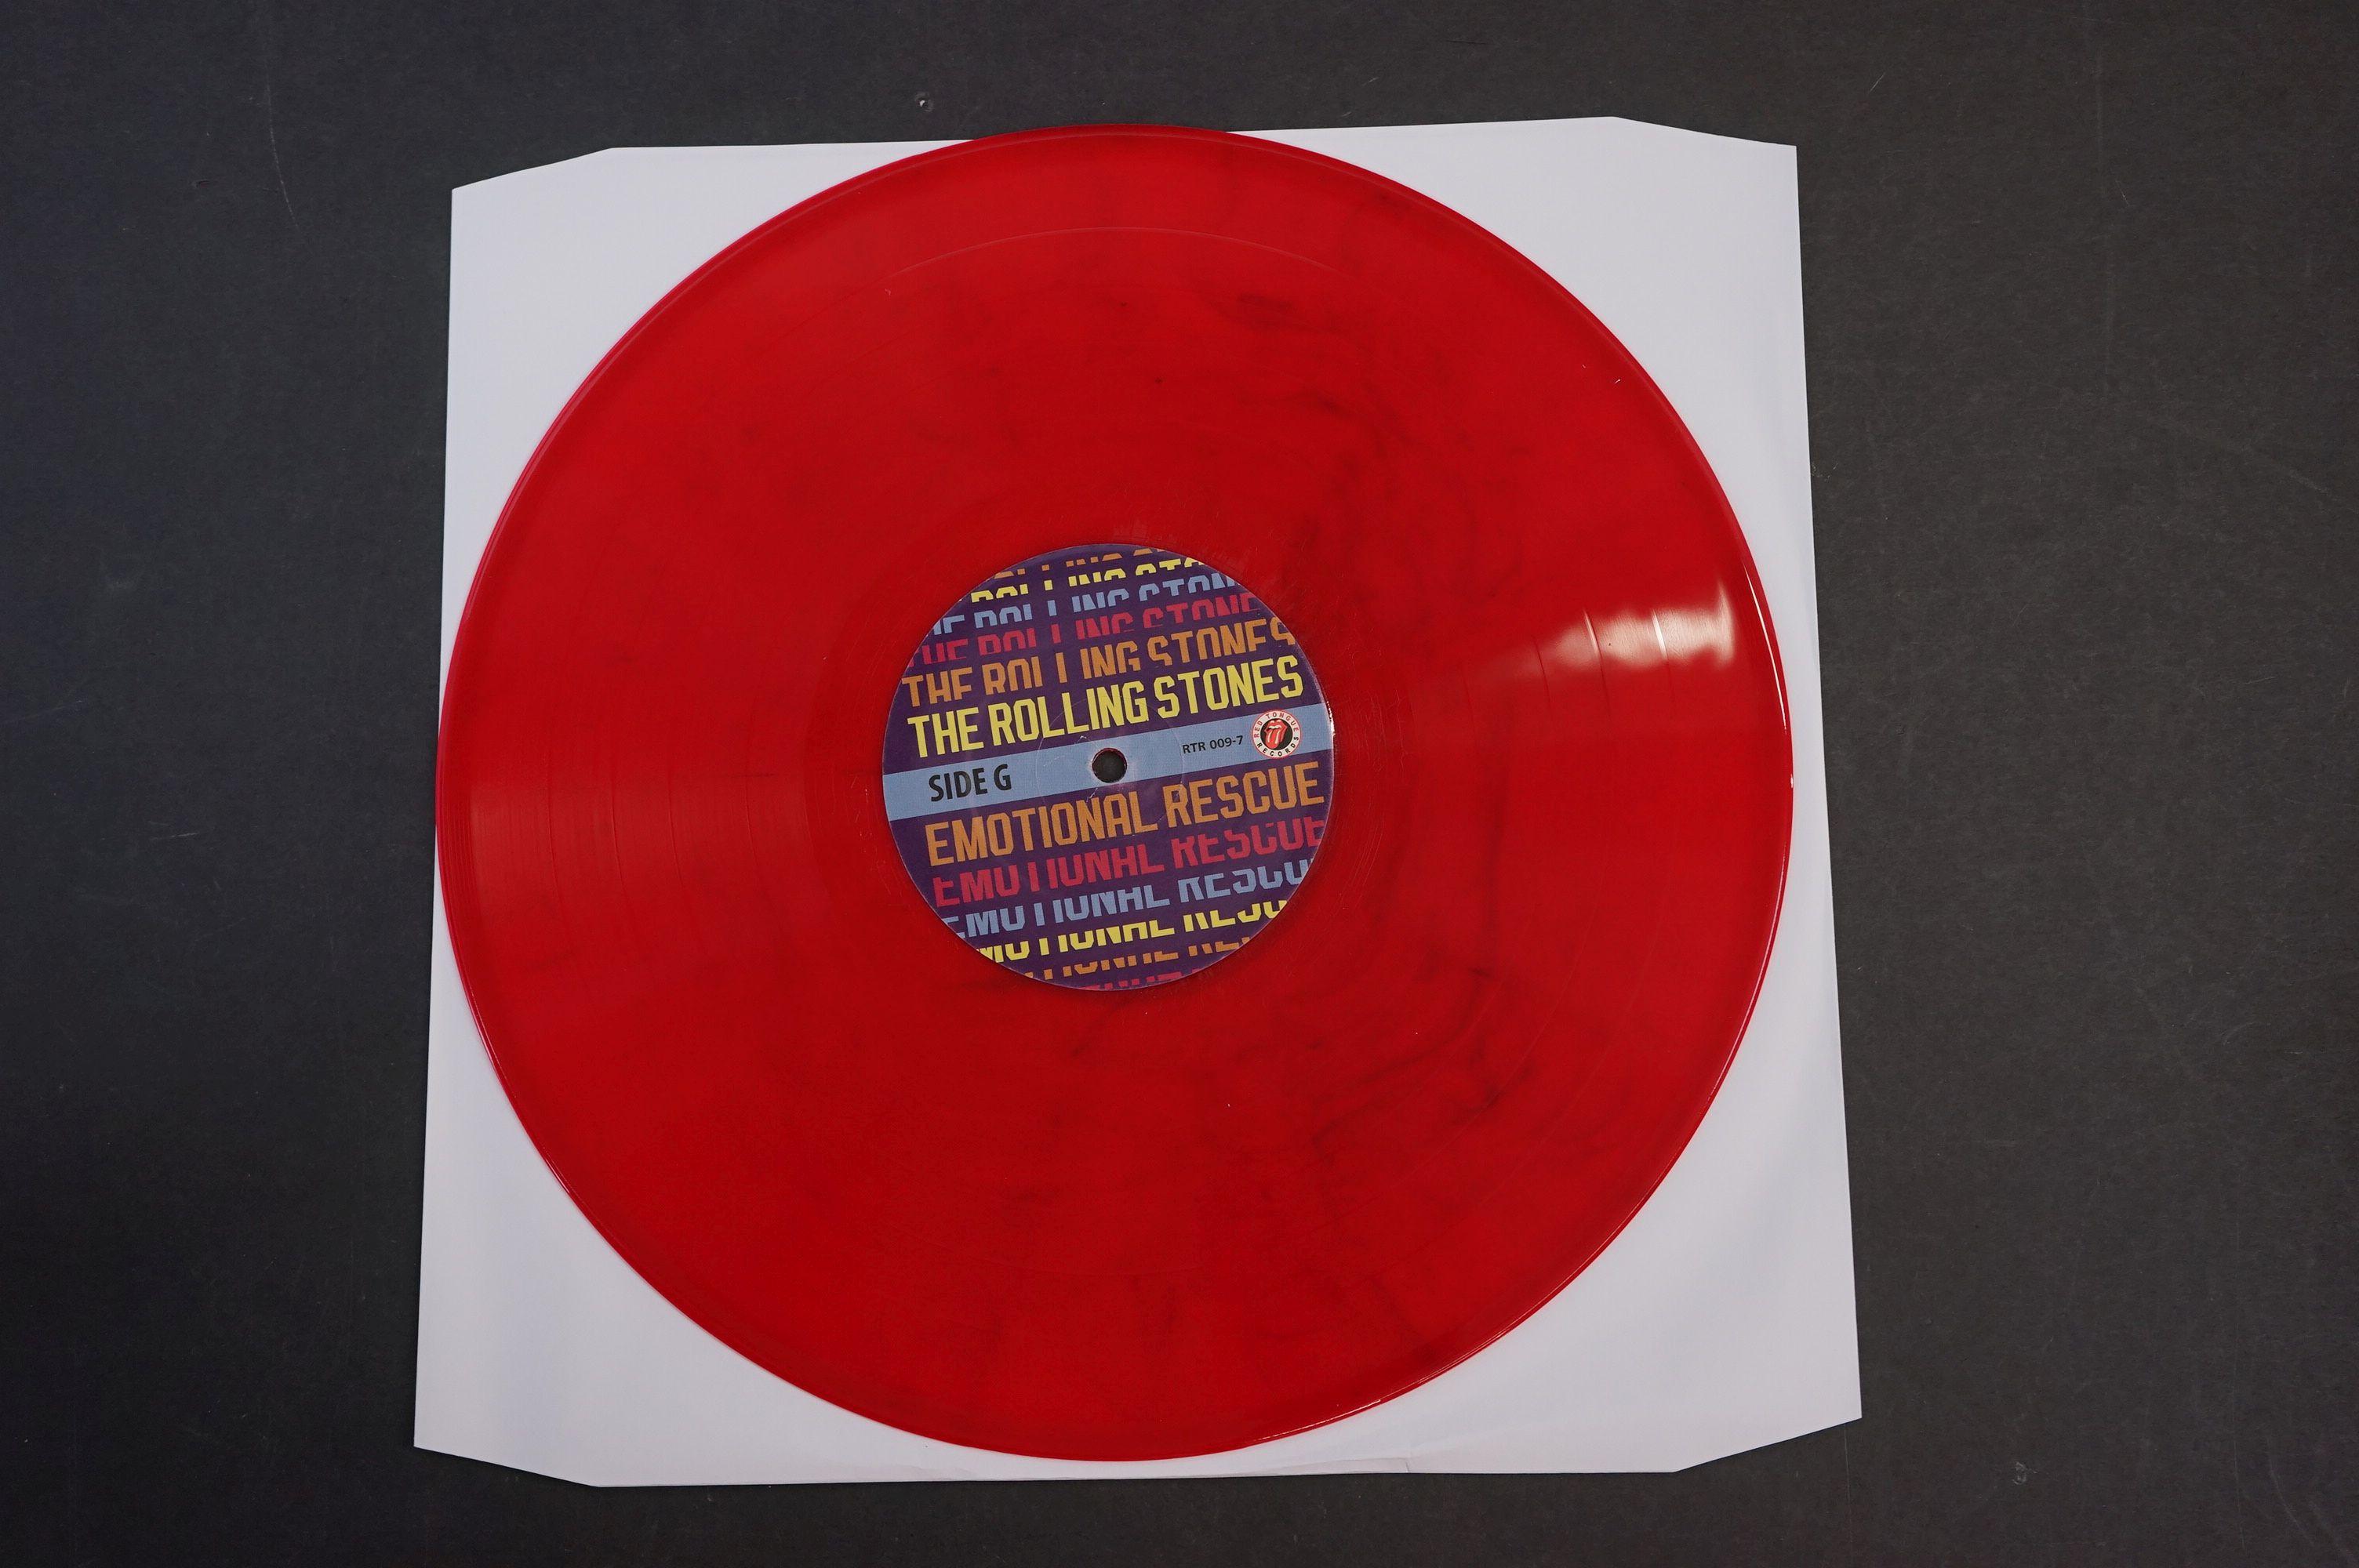 Vinyl - ltd edn The Real Alternate Album Rolling Stones Emotional Rescue 4 LP / 2 CD Box Set, - Image 9 of 12